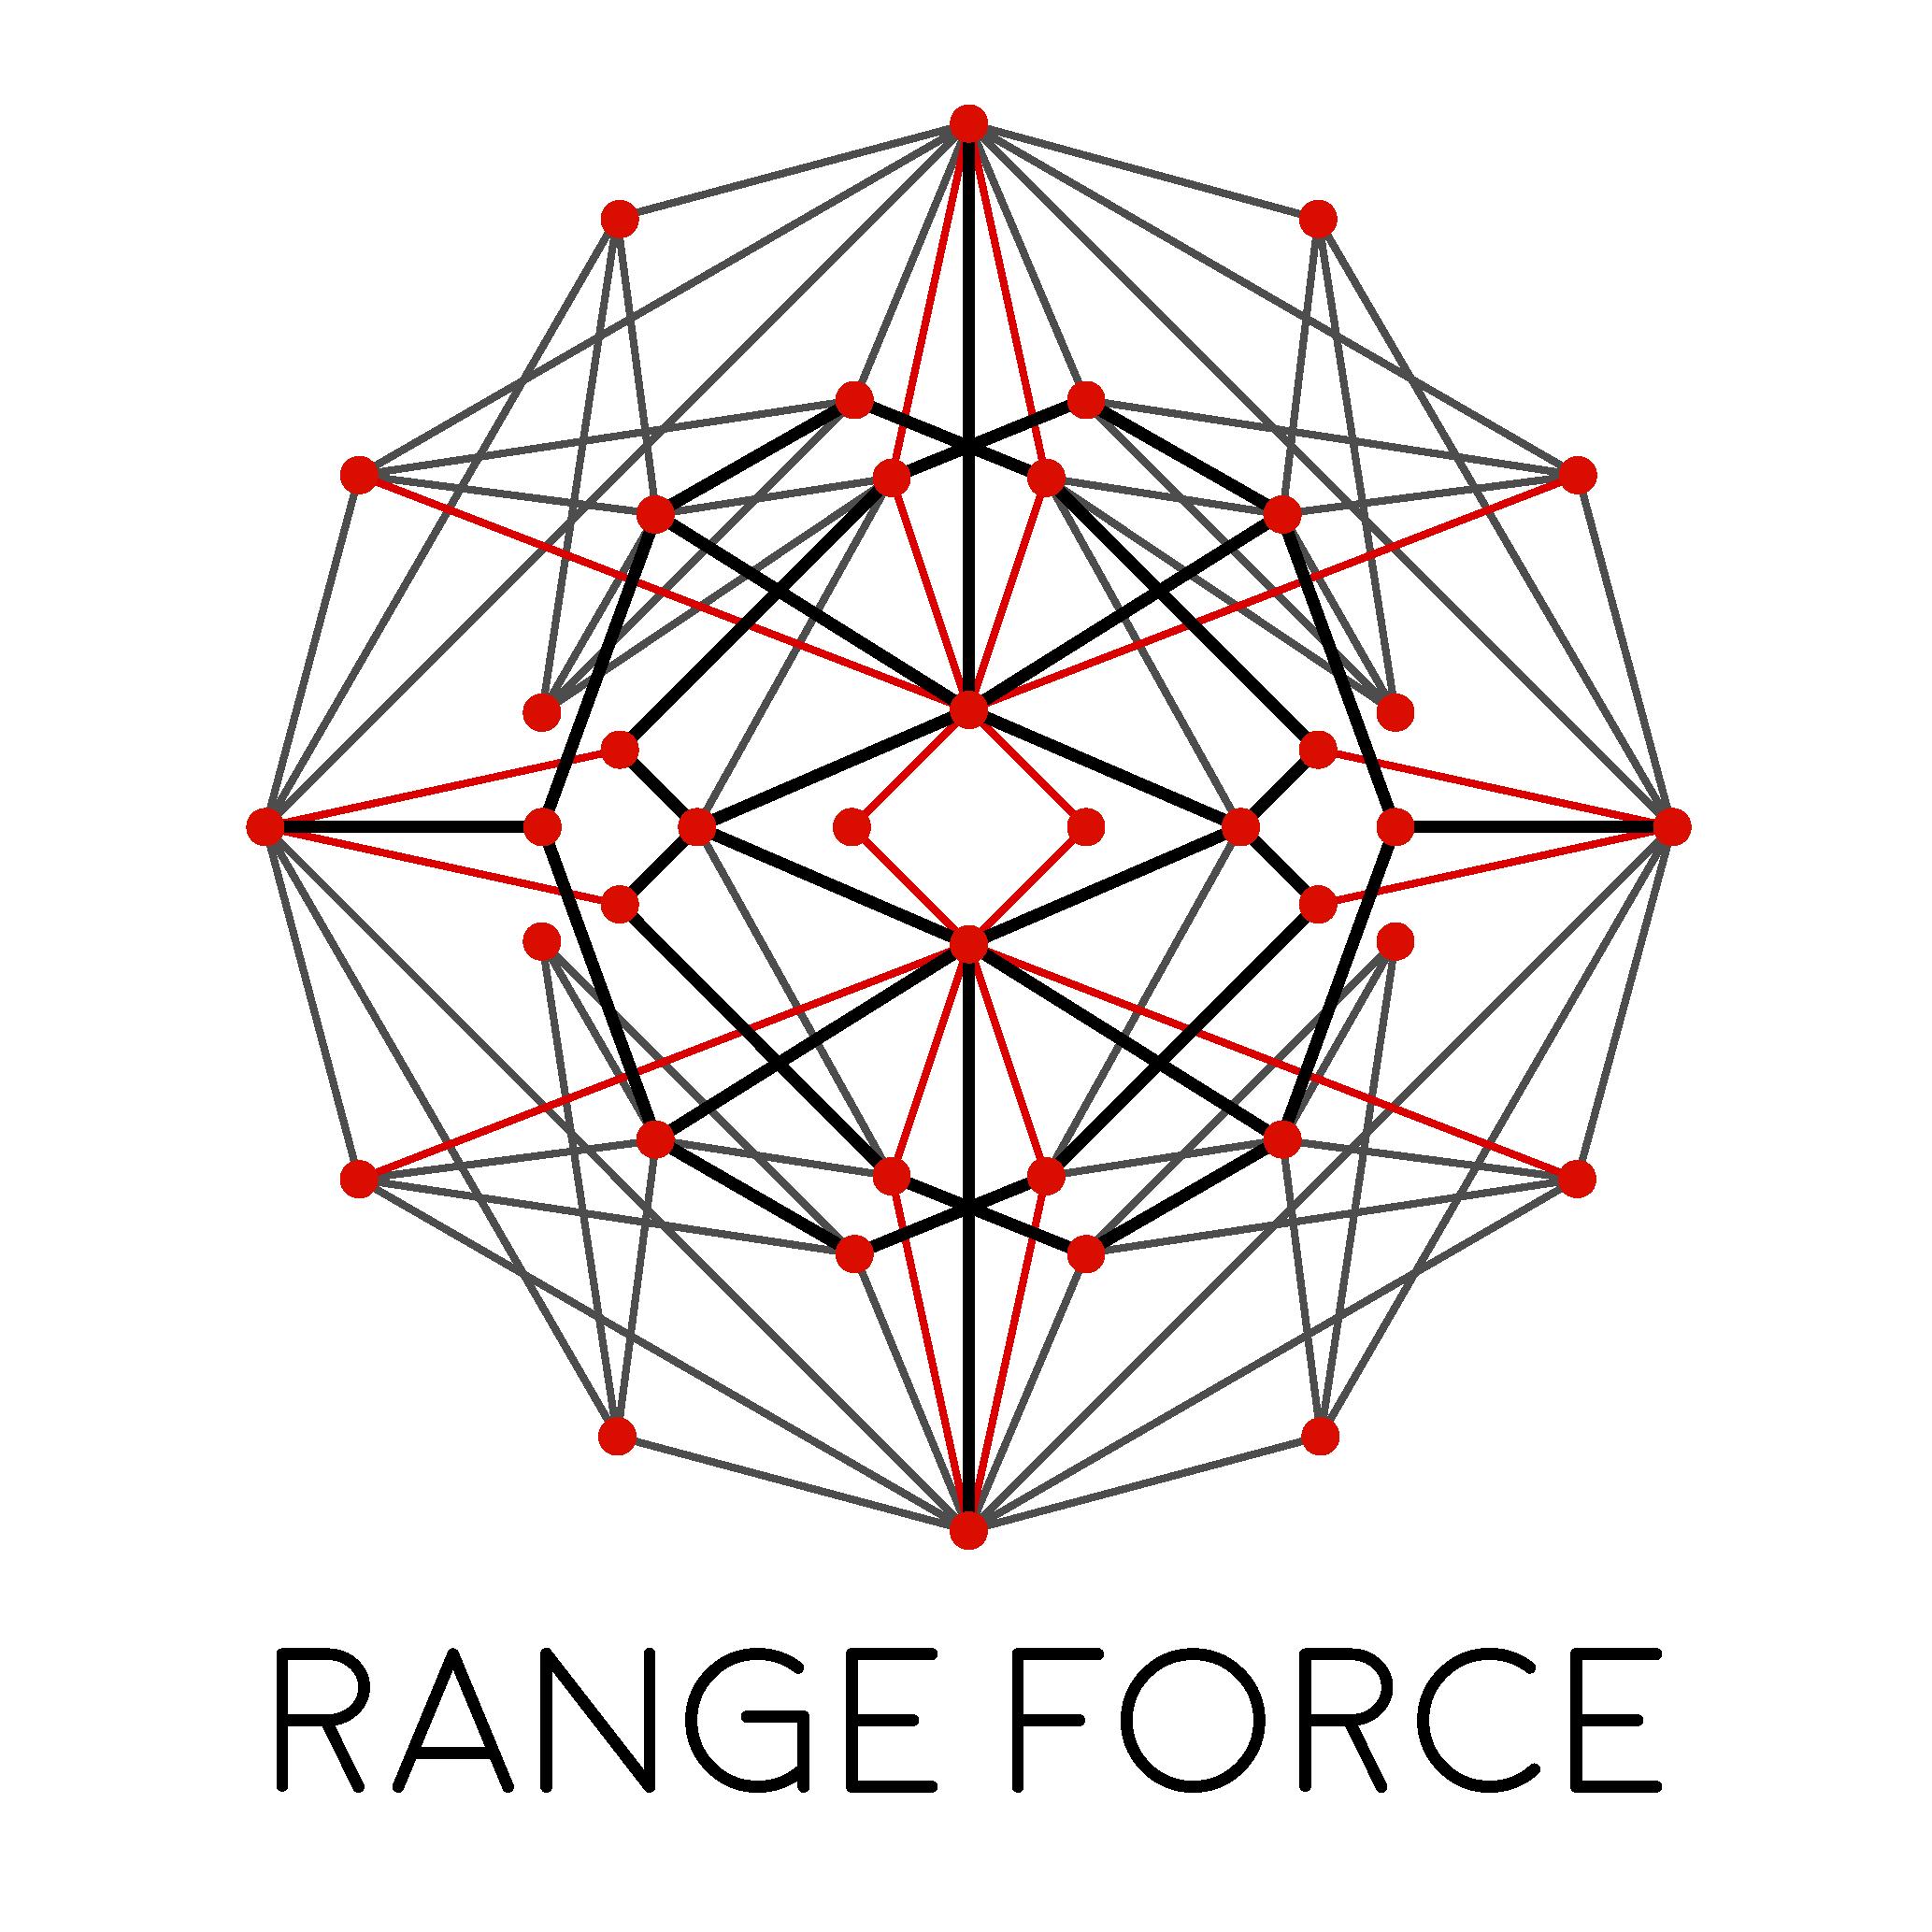 rangeforce logo.jpg